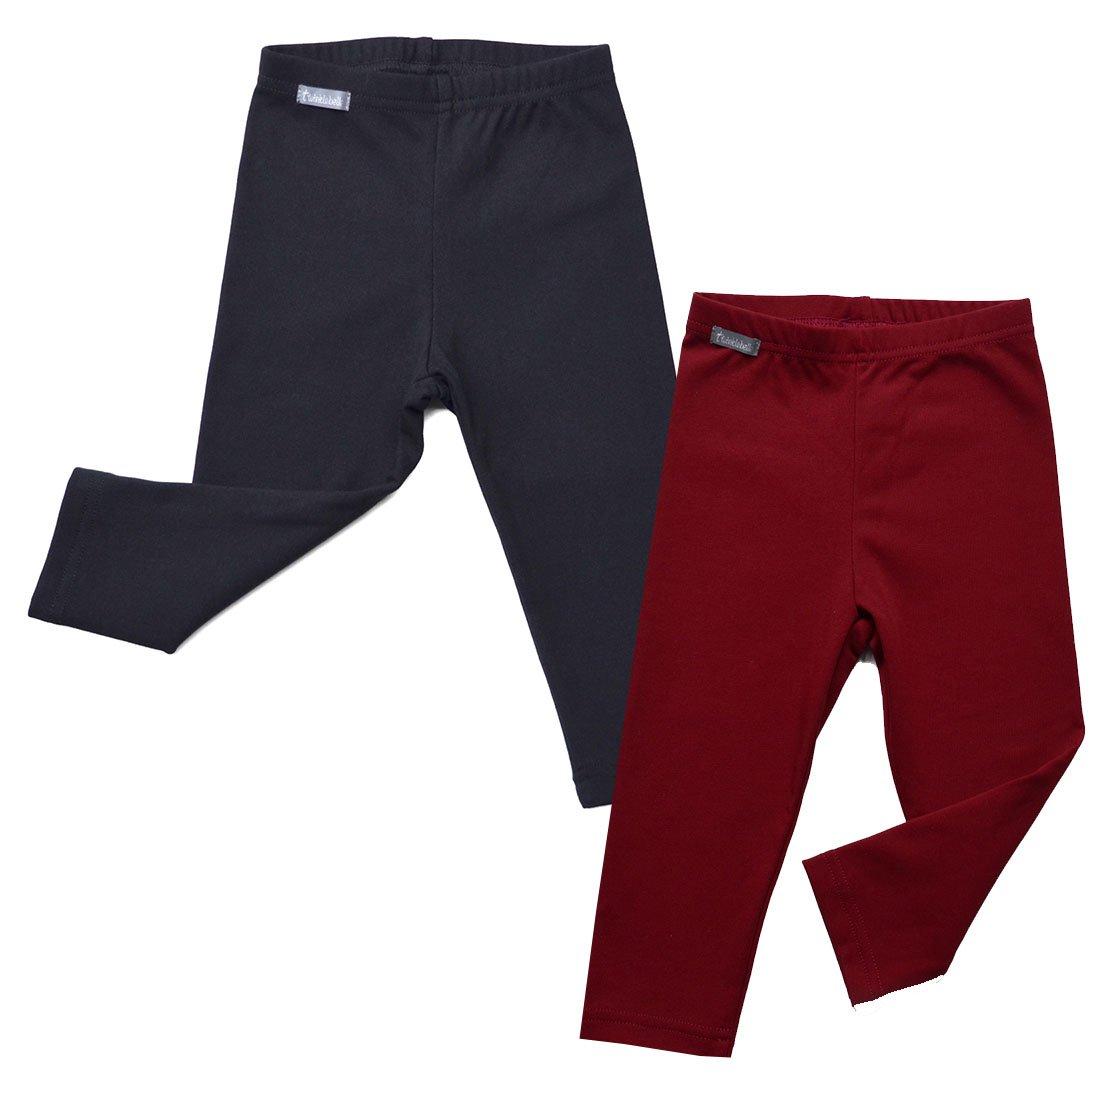 Warm Cozy Unisex Baby Toddler Kids Fall Leggings (2-Pack: Black/Maroon Red -3T) by JAN & JUL